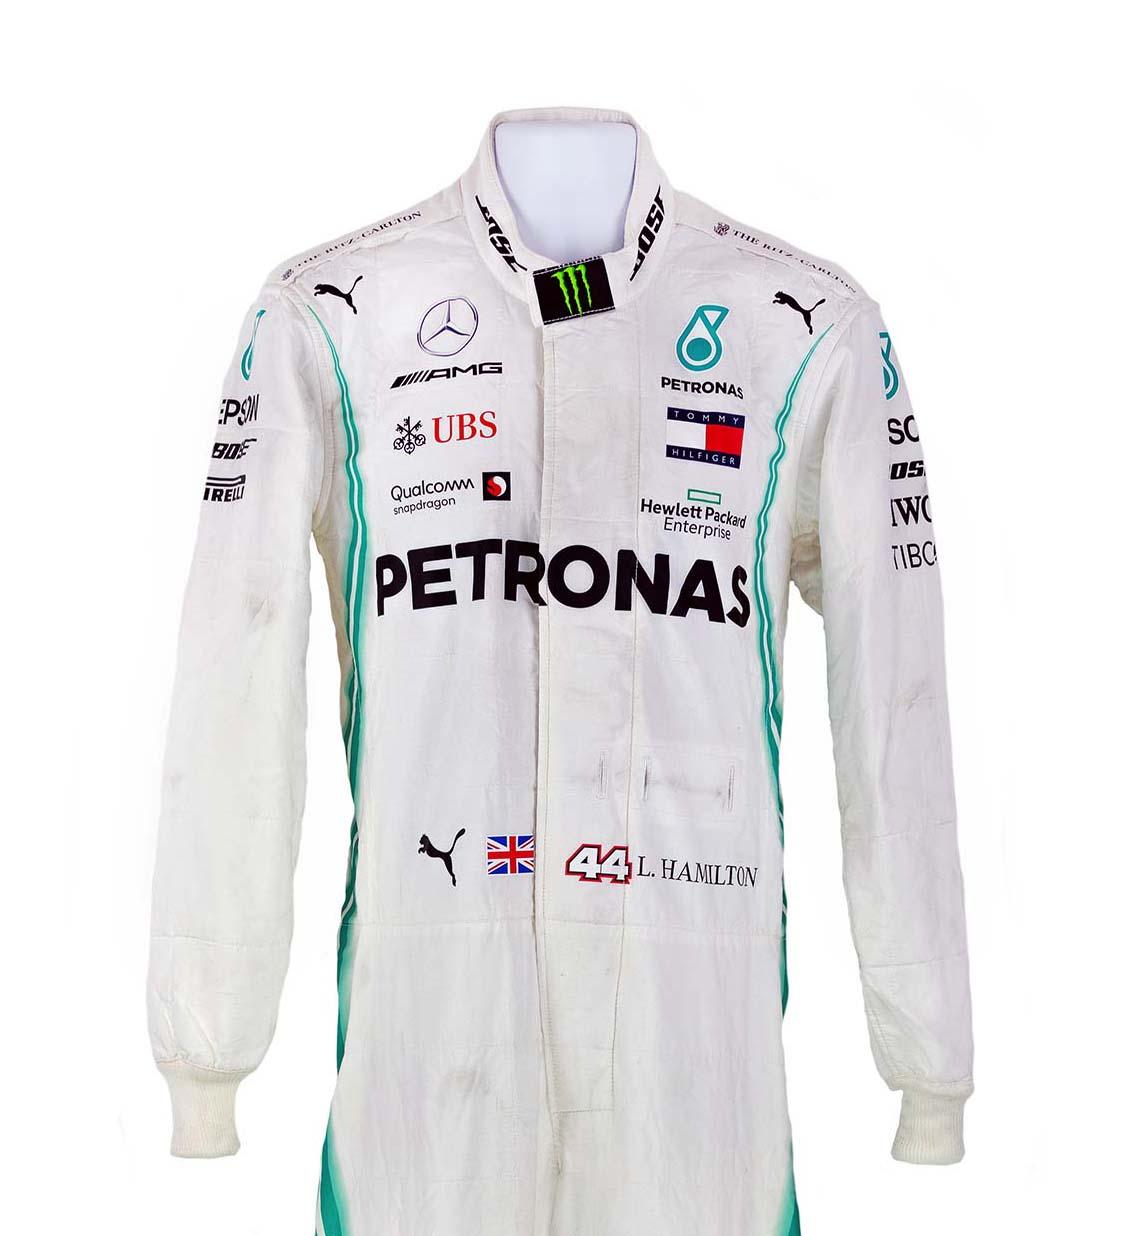 2019 Lewis Hamilton Race Used AMG Mercedes F1 World